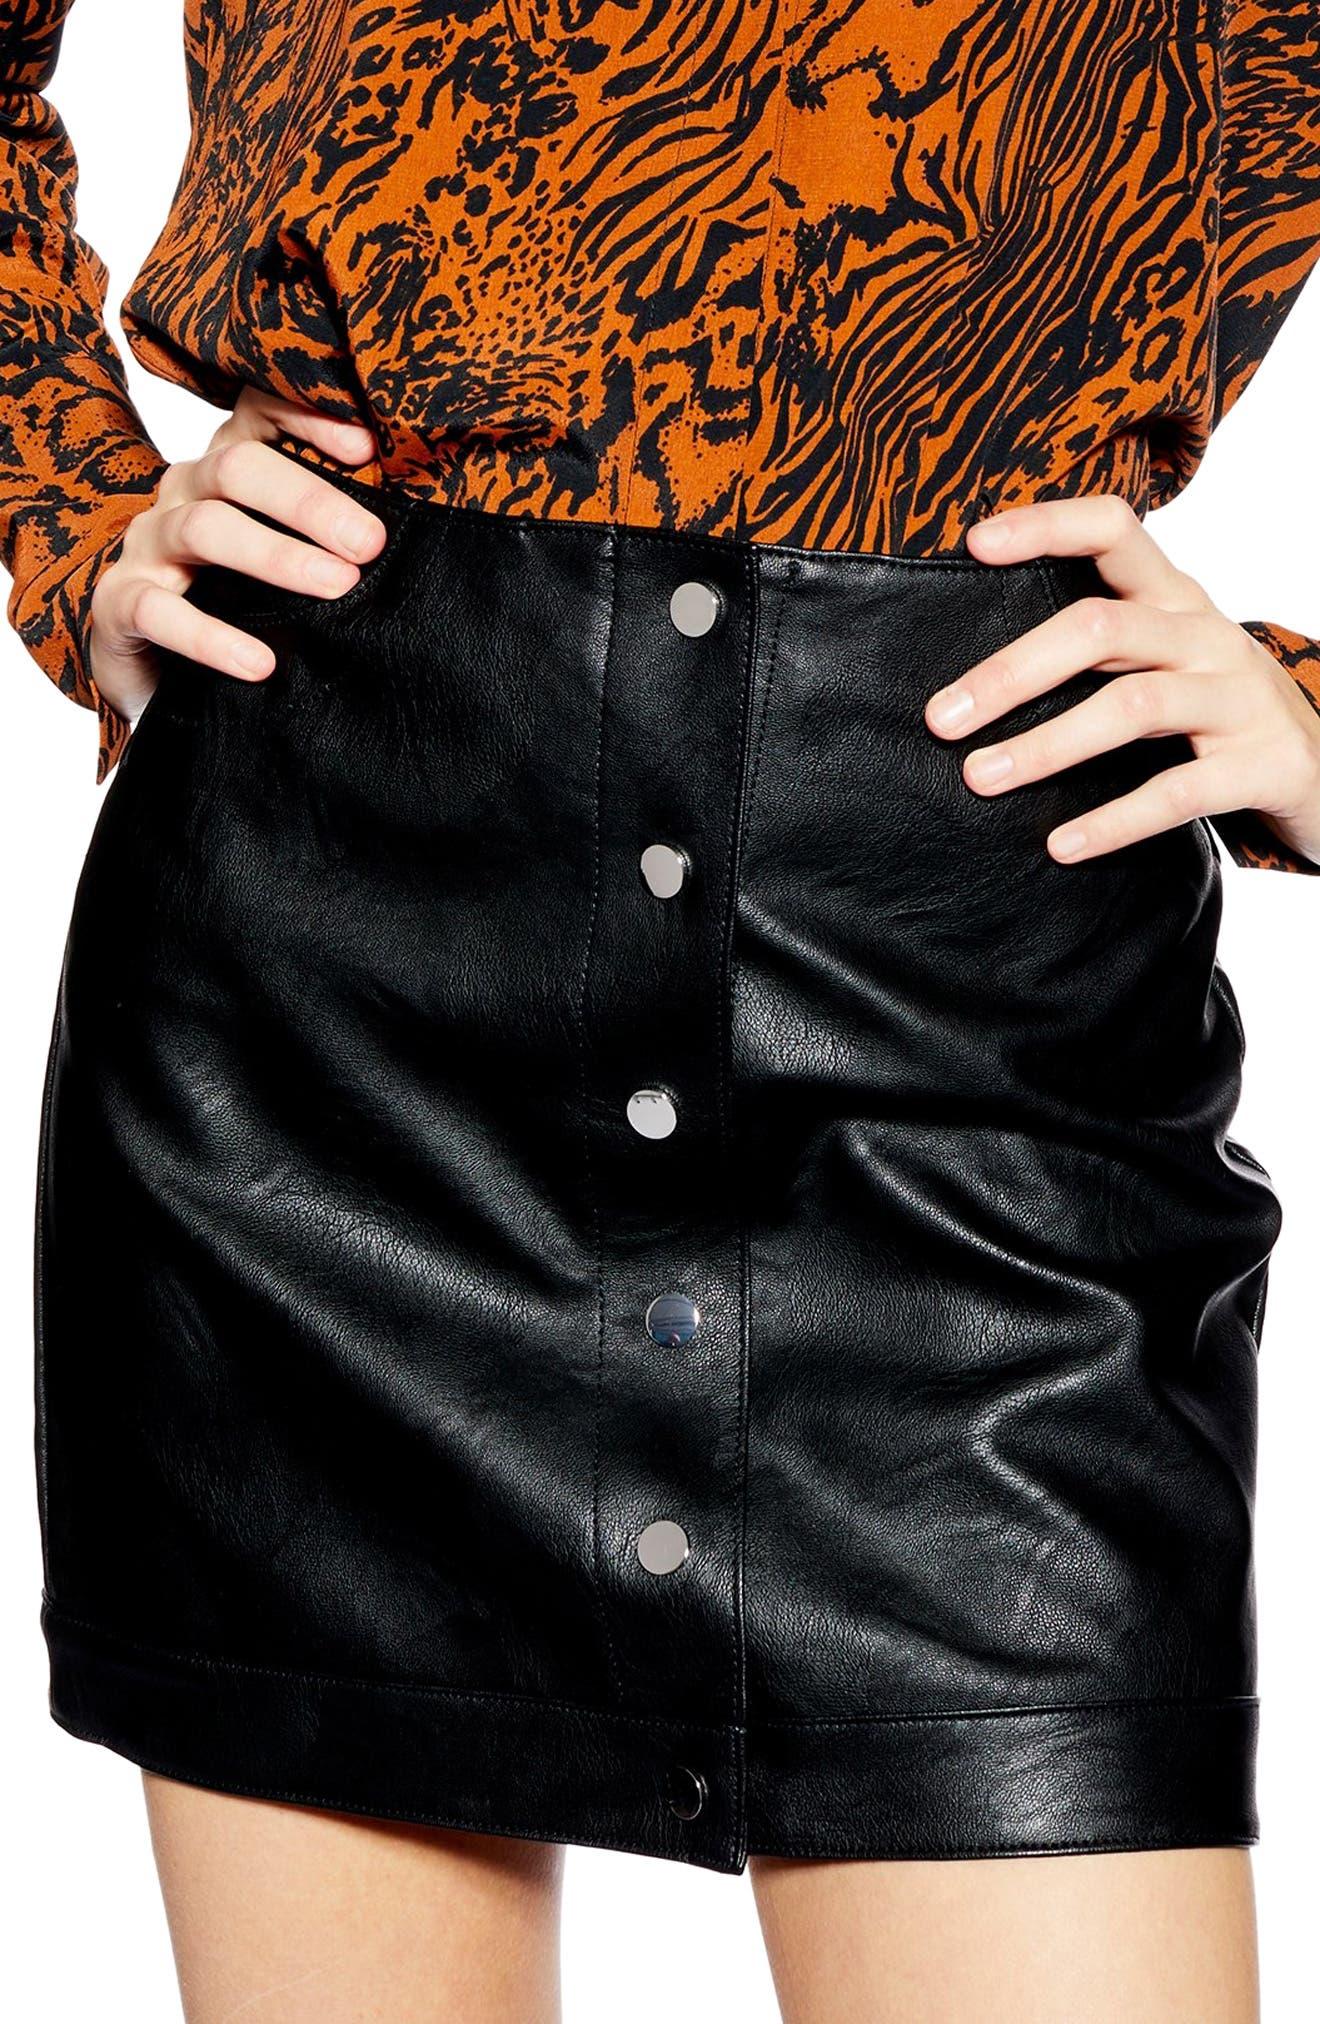 Dixie Faux Leather Miniskirt,                             Alternate thumbnail 3, color,                             BLACK